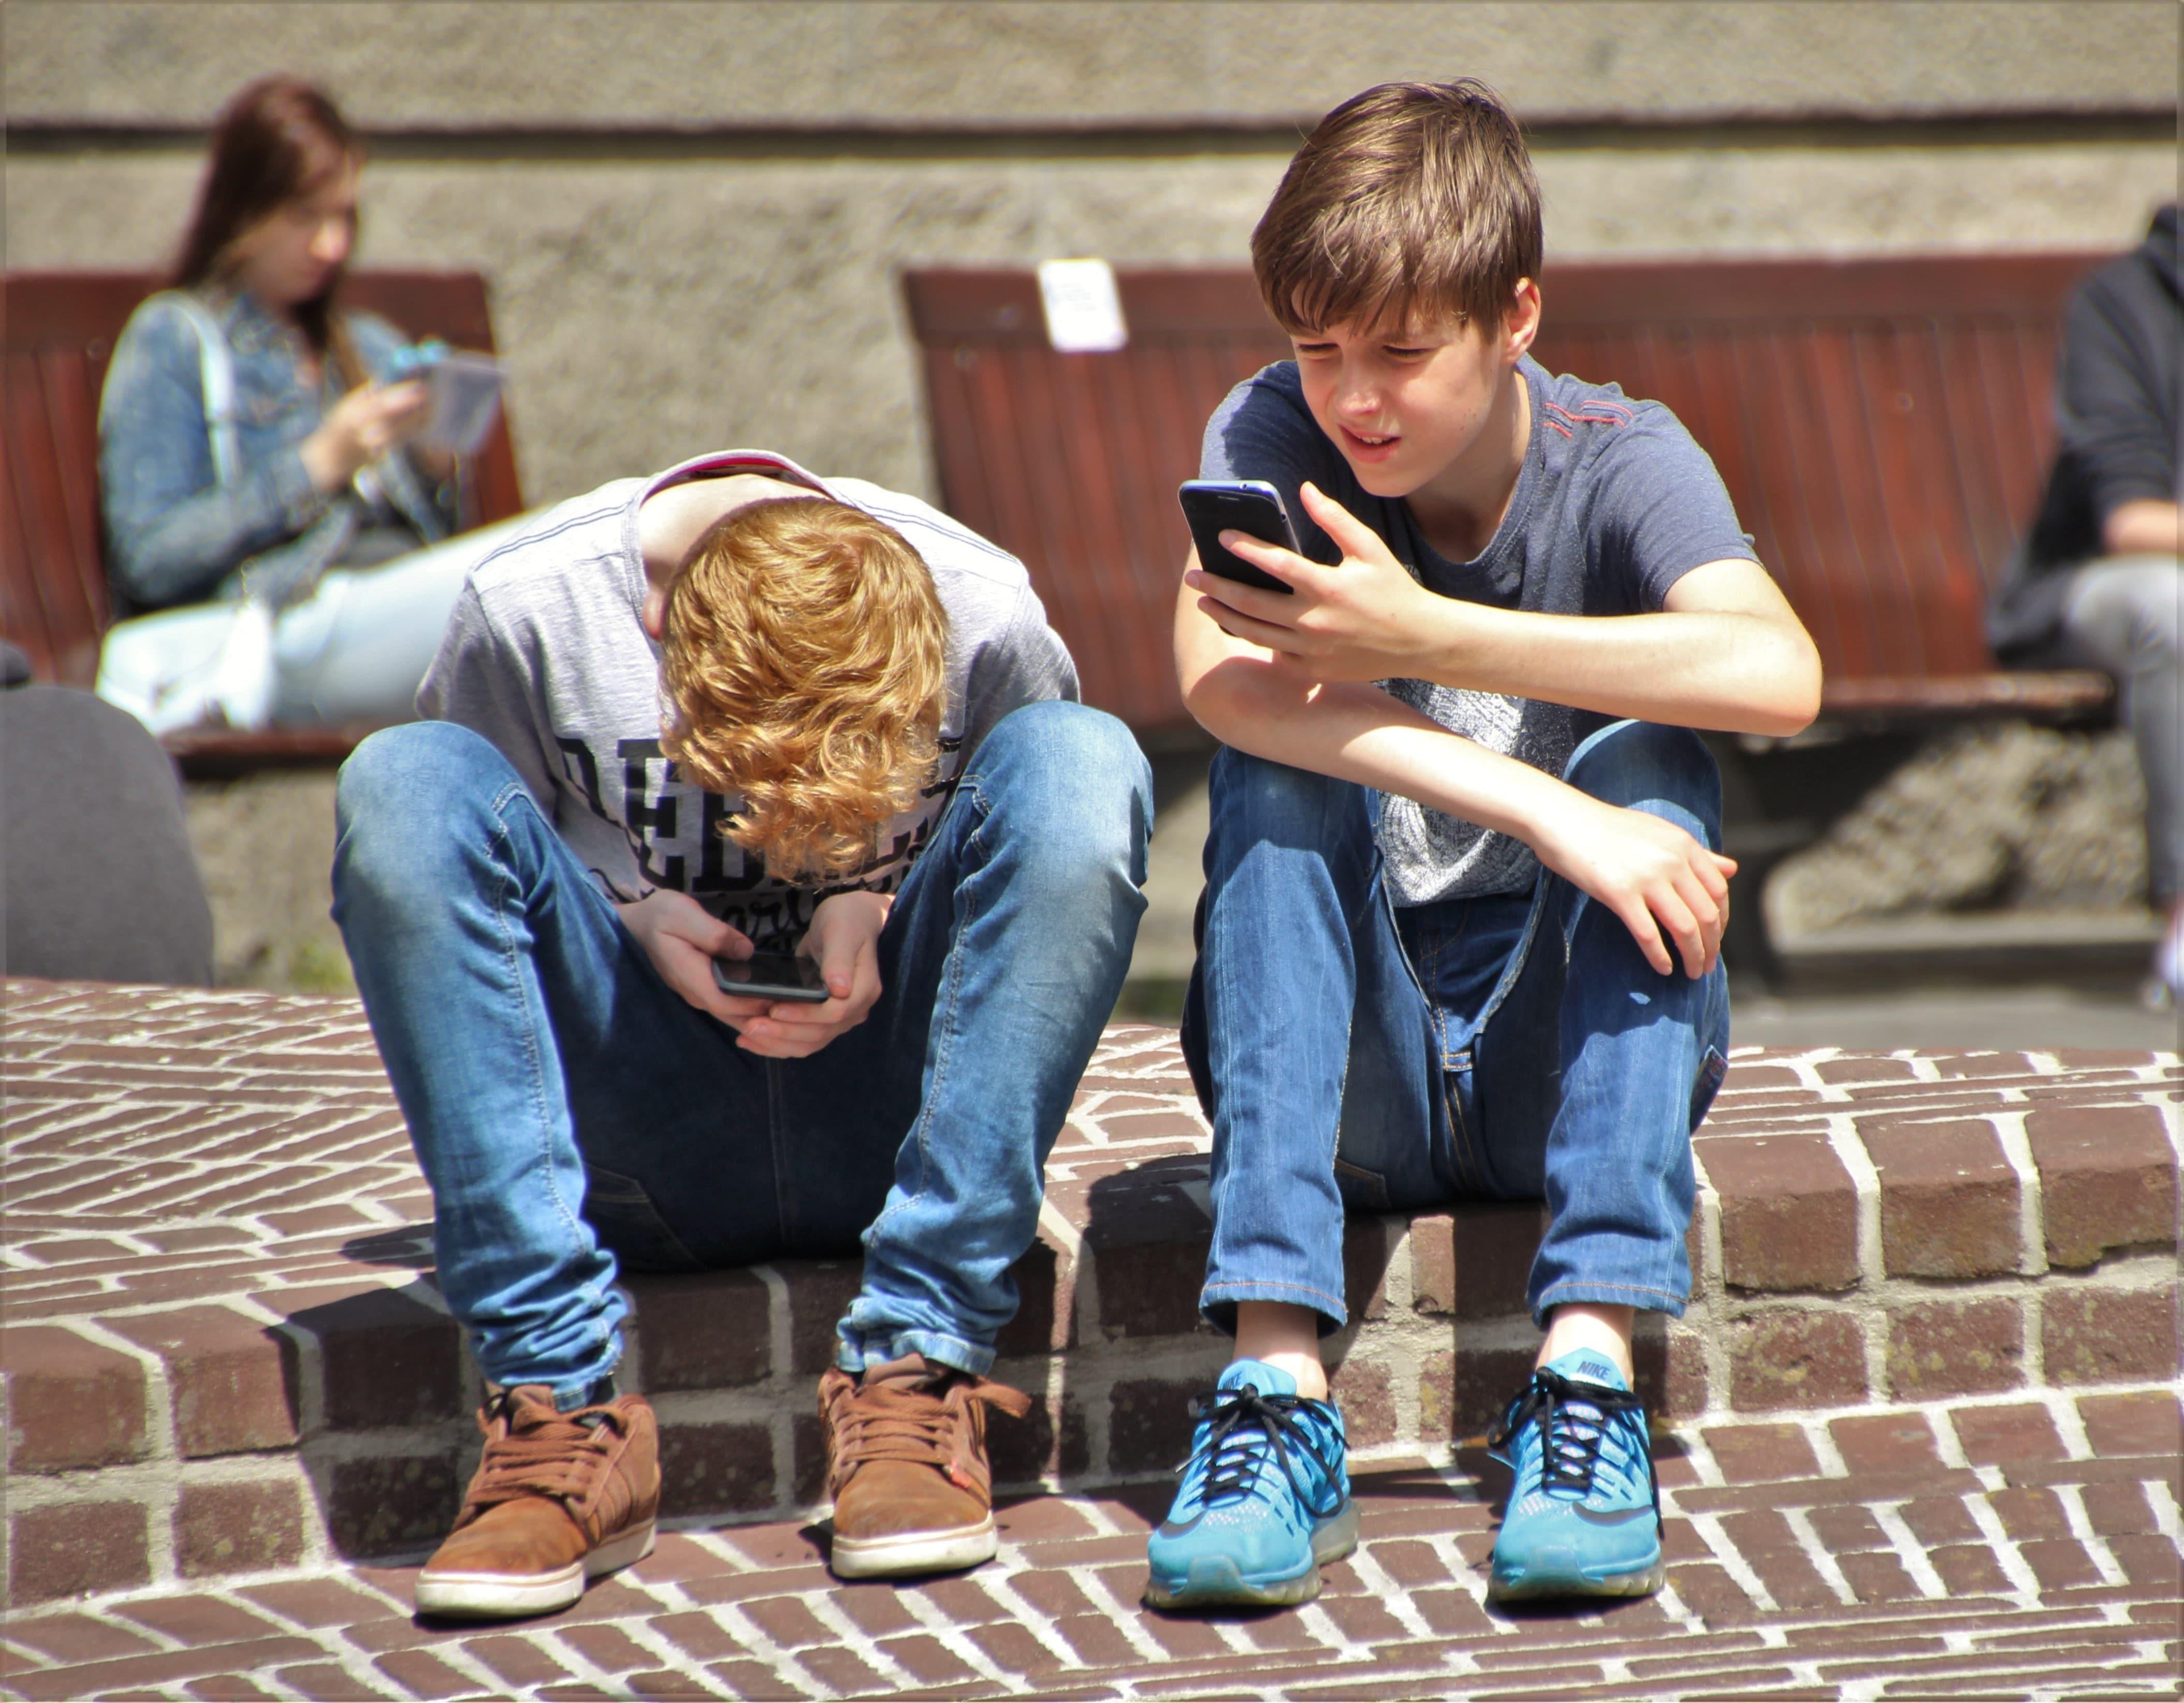 adolescents-smartphones